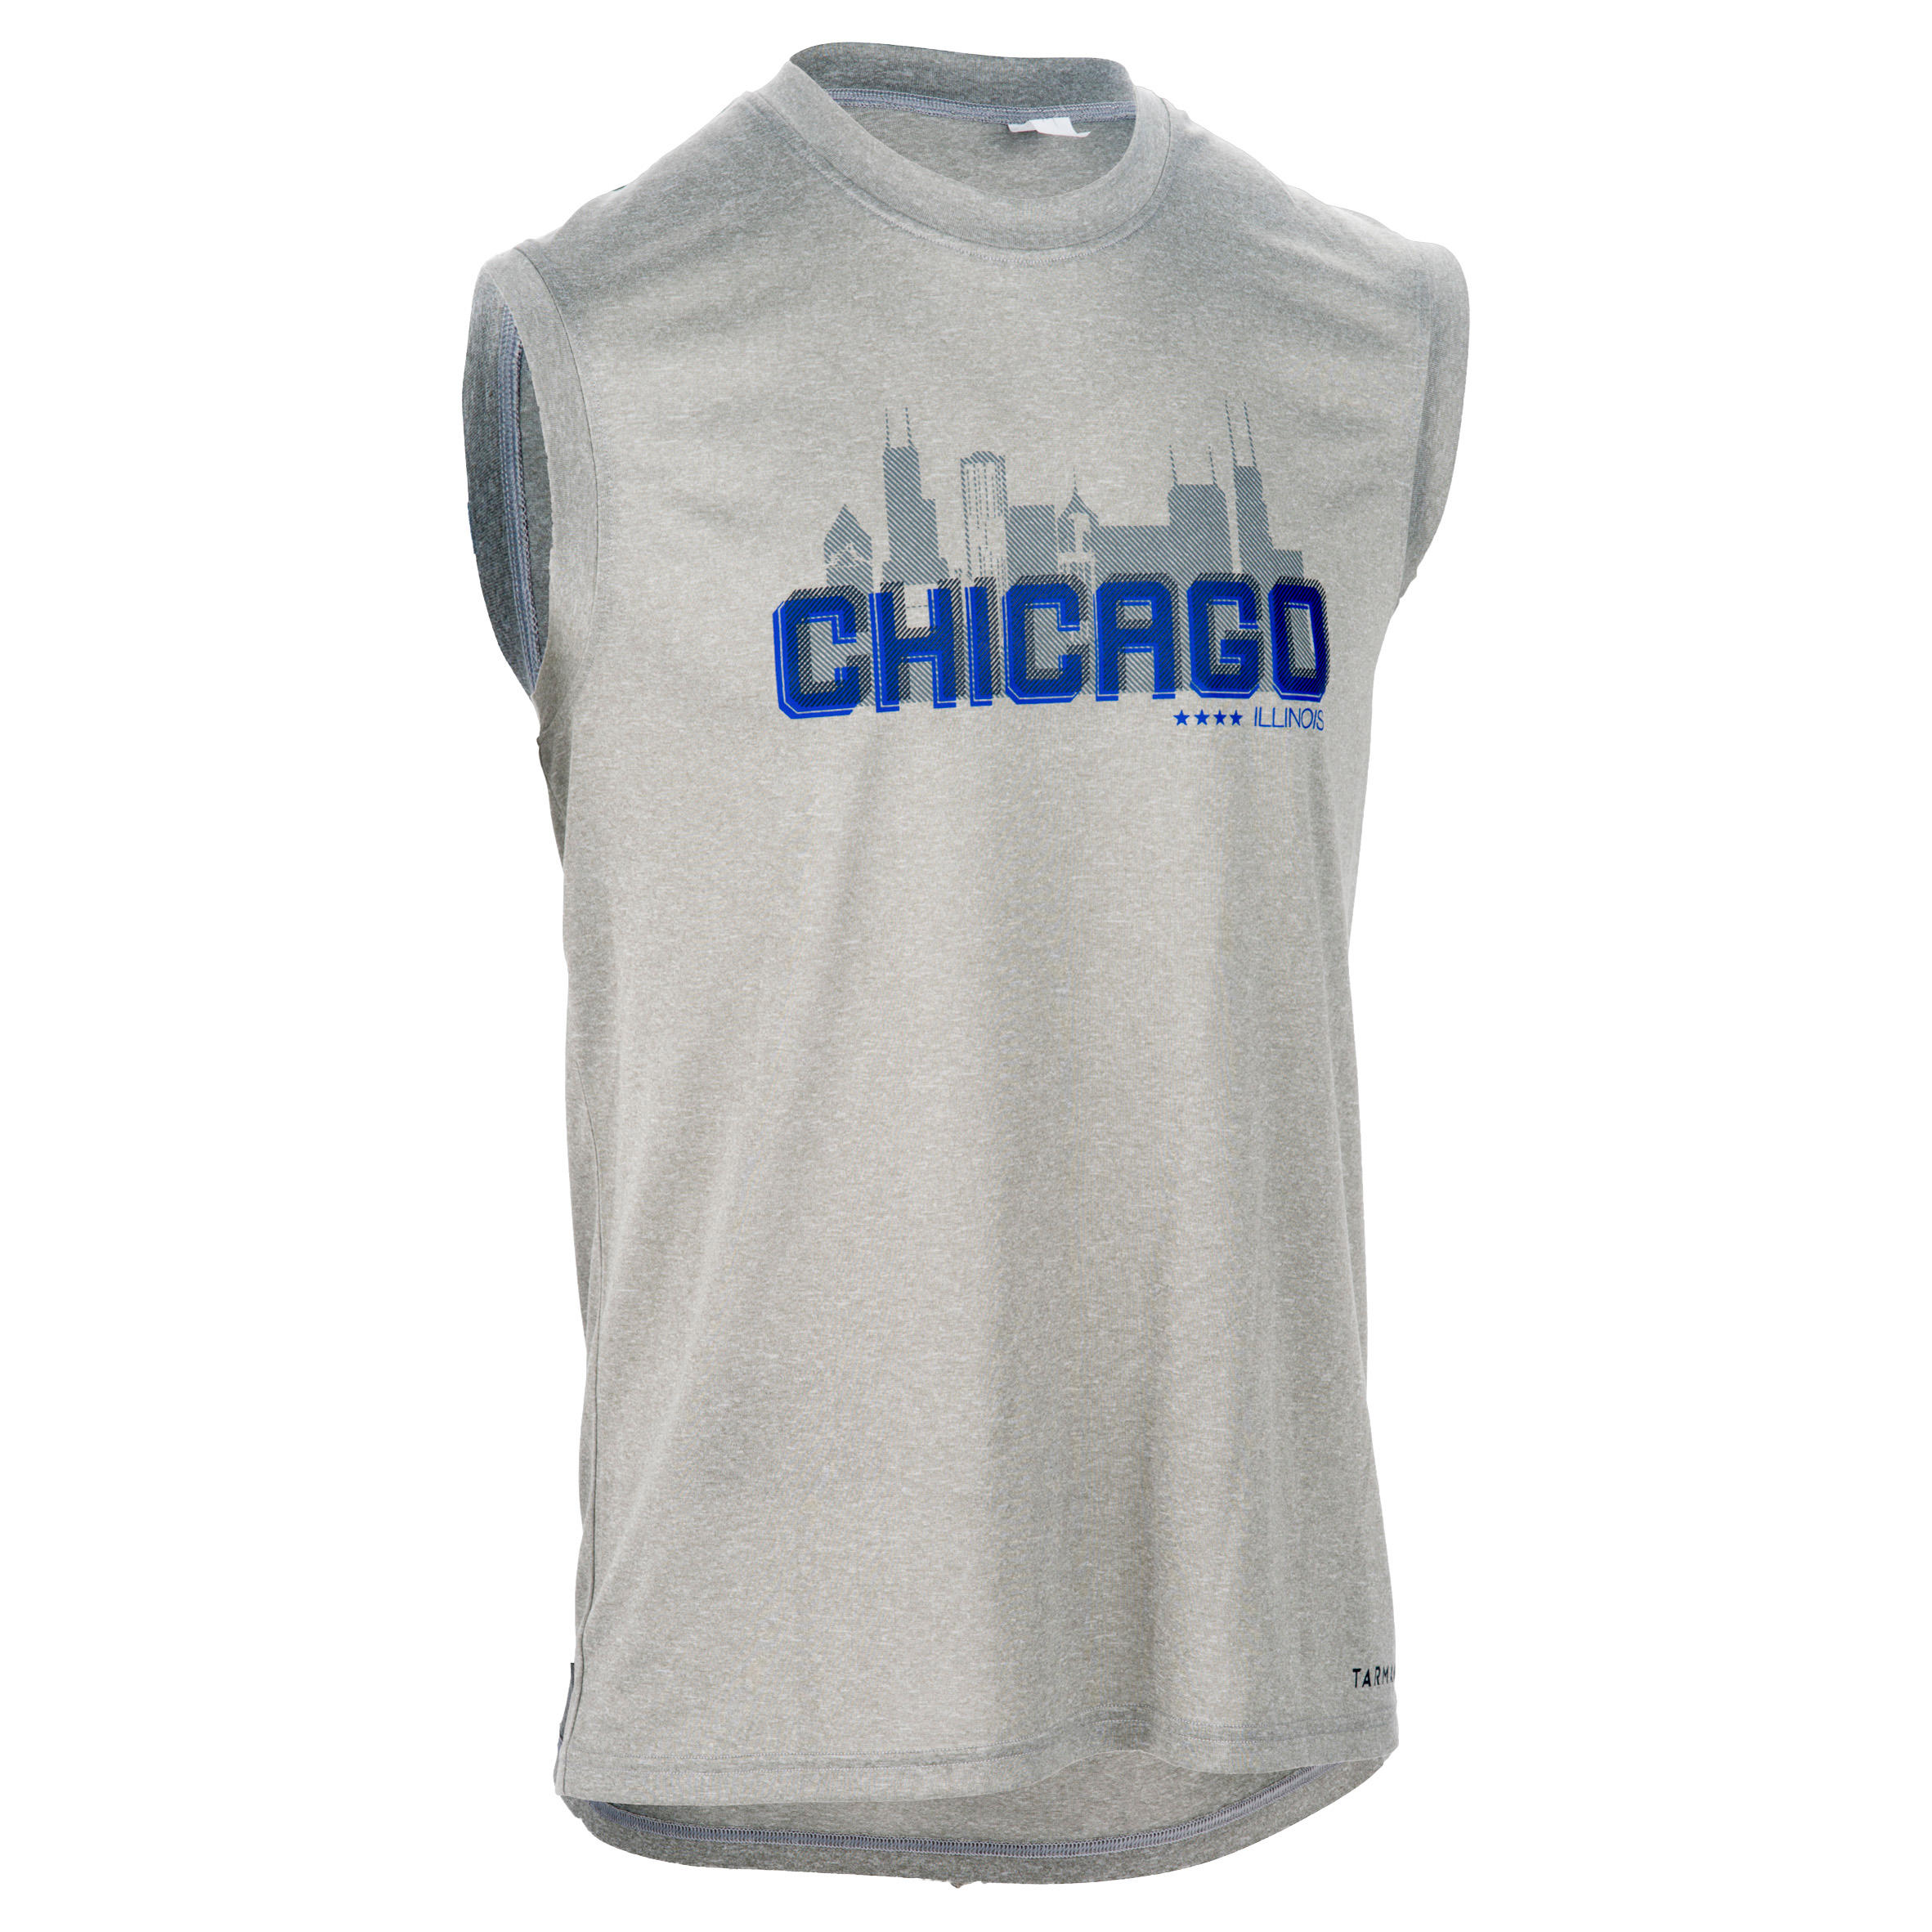 Intermediate Basketball Tank Top - Chicago/Grey/Blue